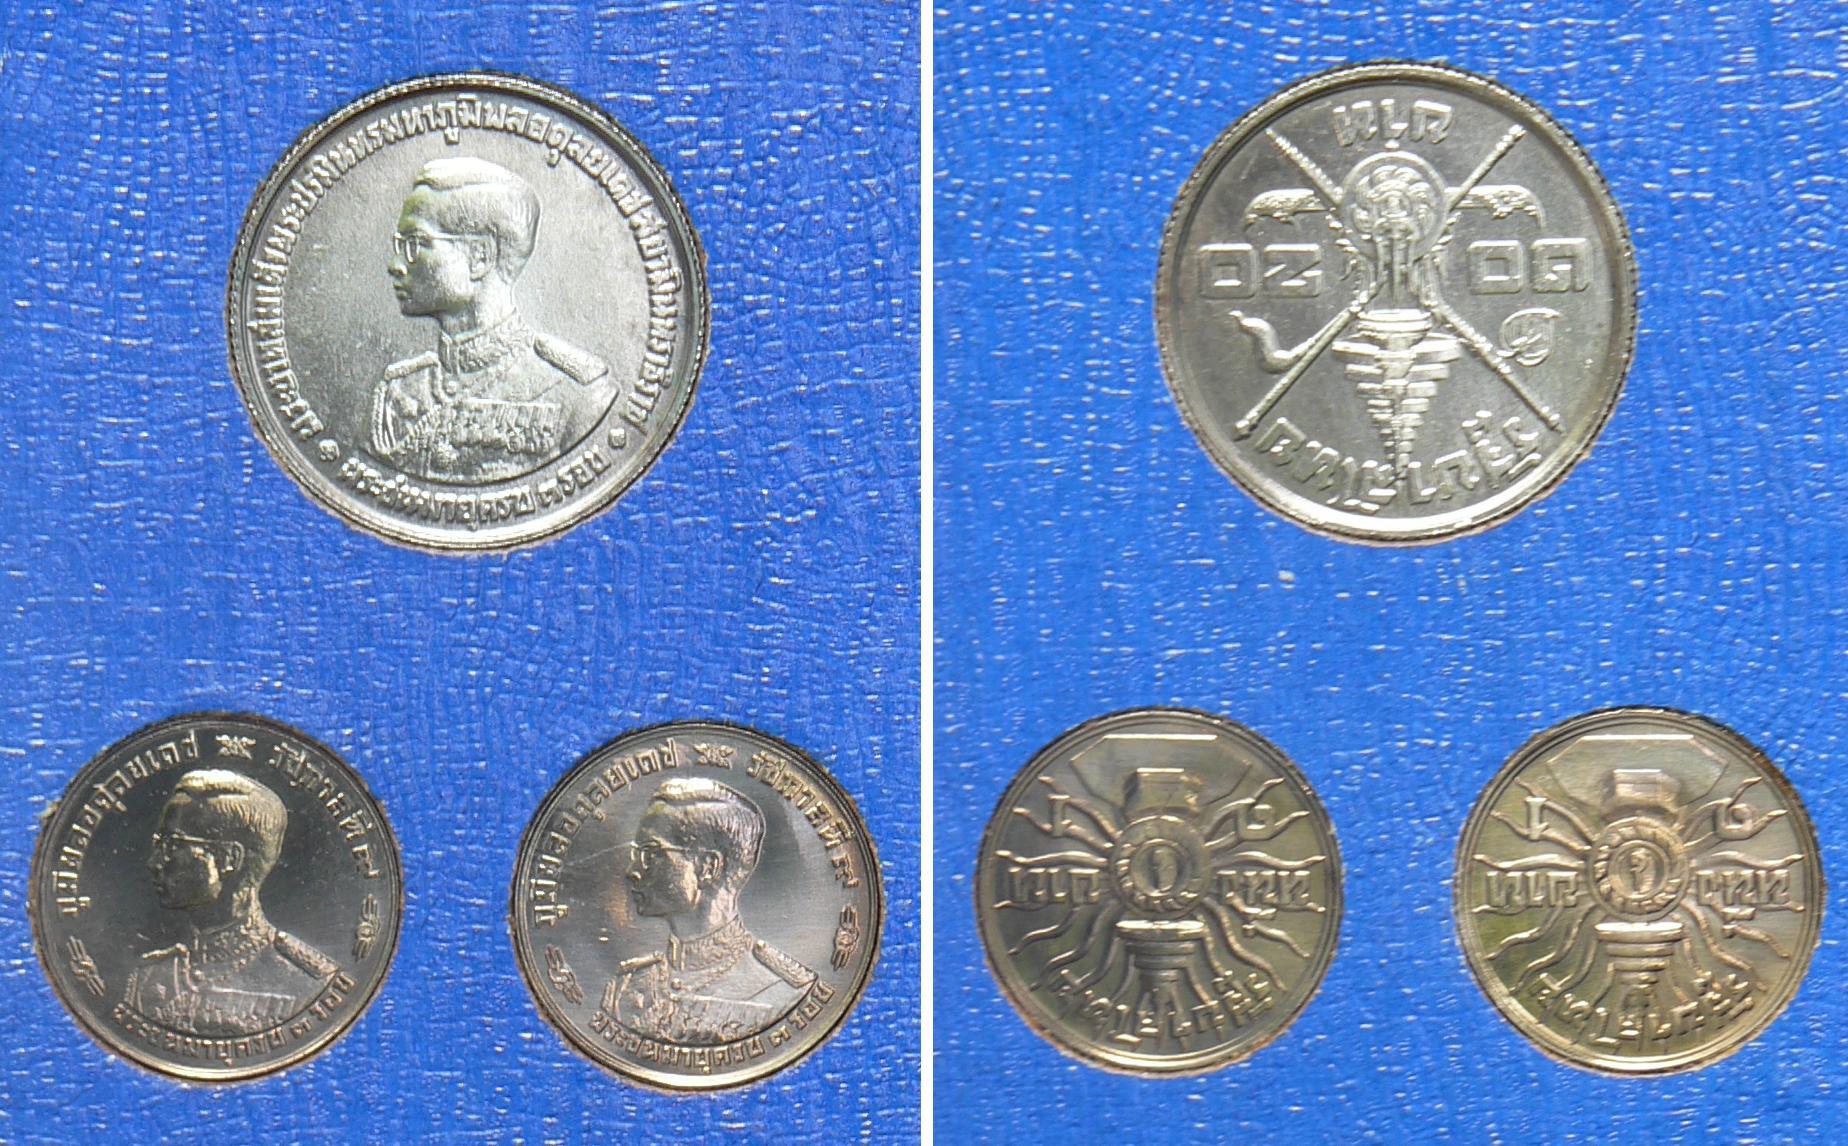 Thailand 1963, two 1 Baht, Y-85, one 20 Baht, Y-86, BU. Set of 3: $15